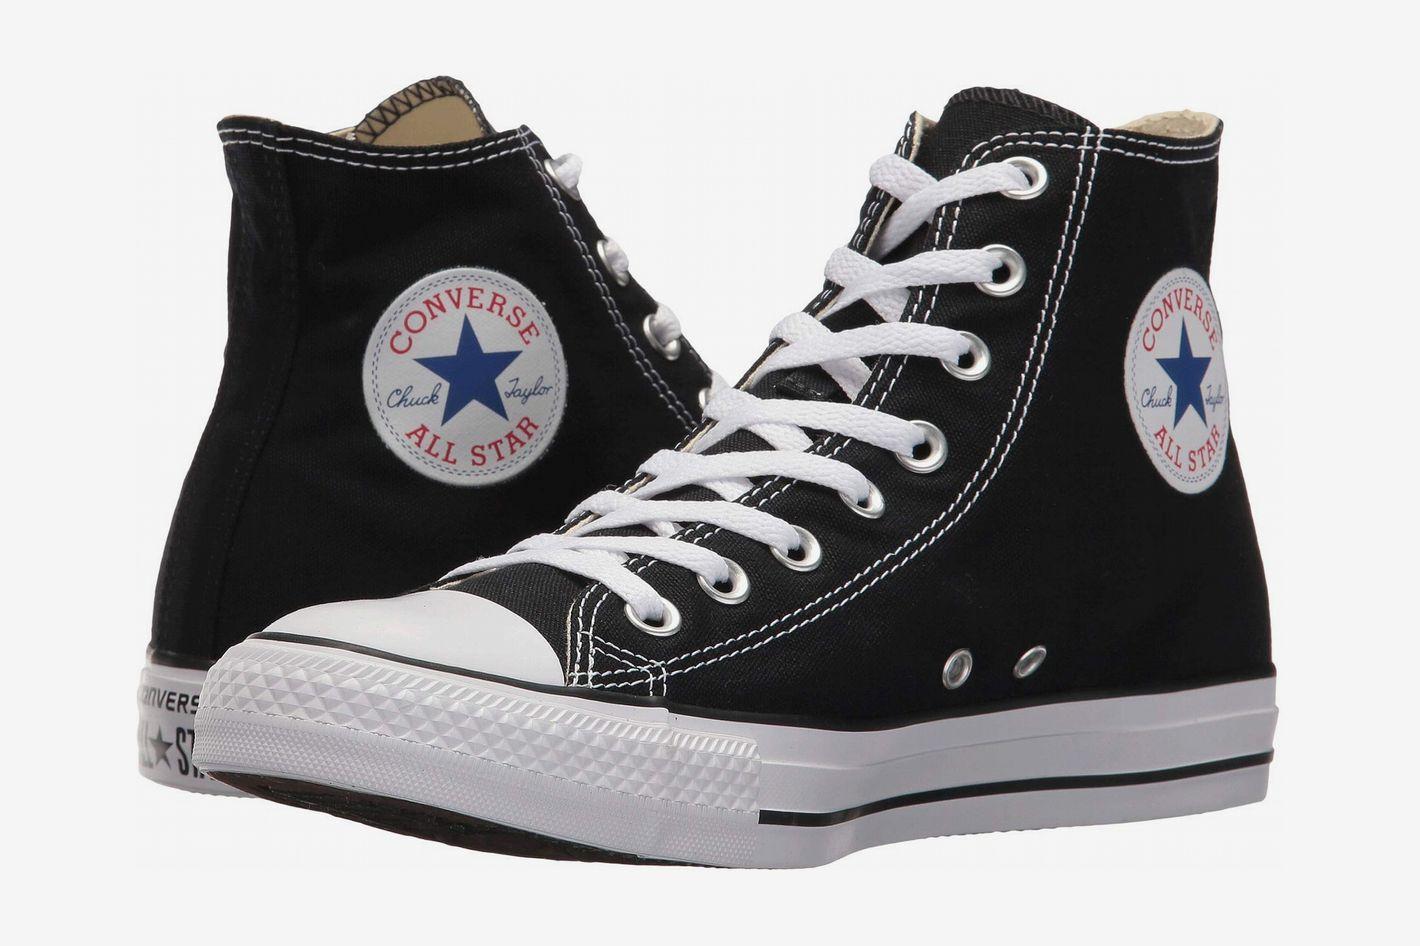 Converse Chuck Taylor All Star High-Tops